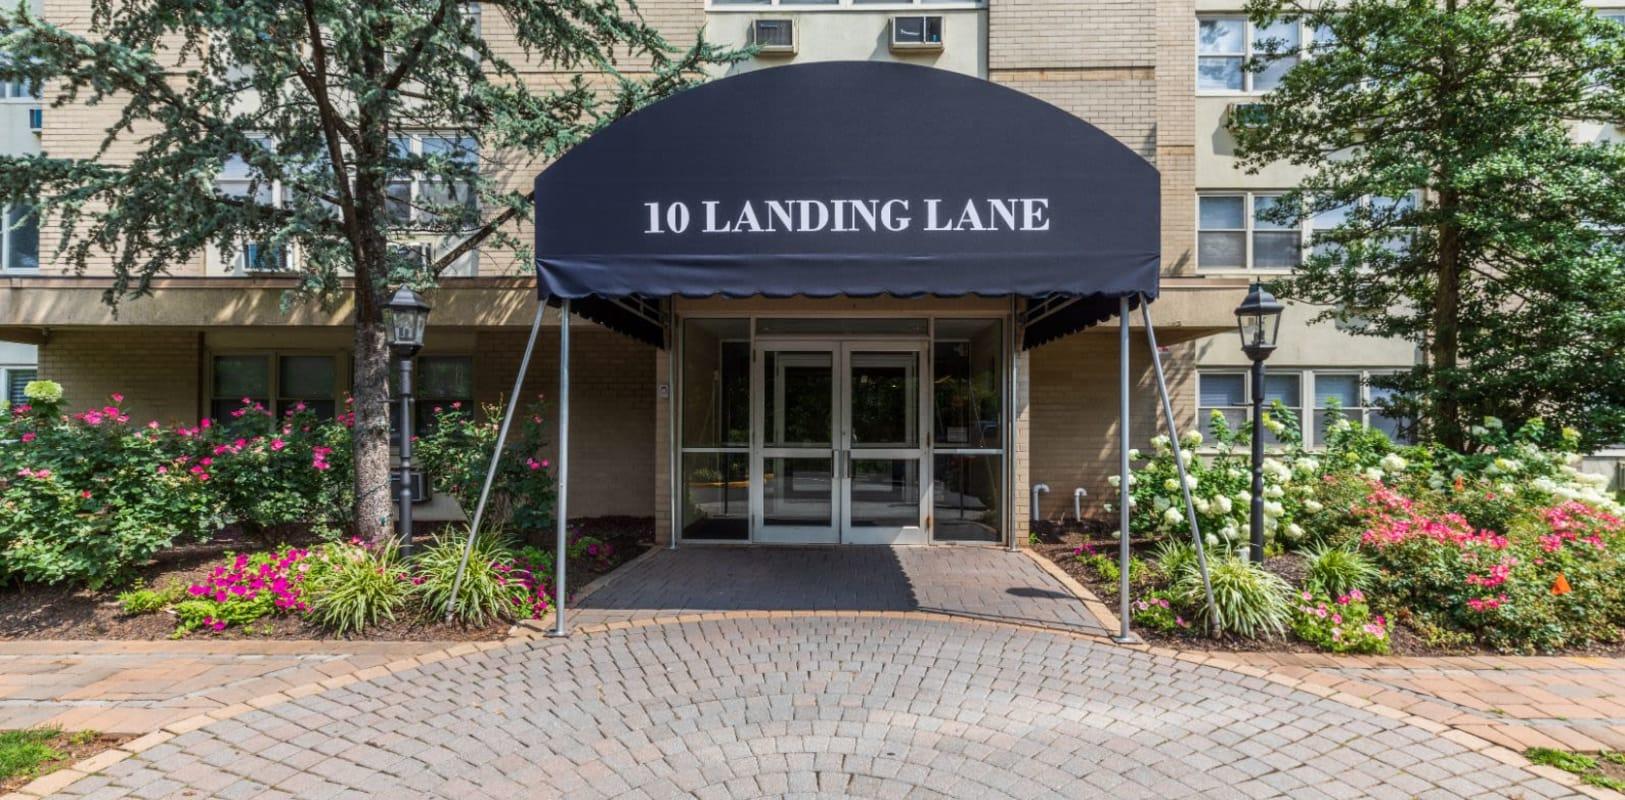 Entrance to 10 Landing Lane in New Brunswick, New Jersey